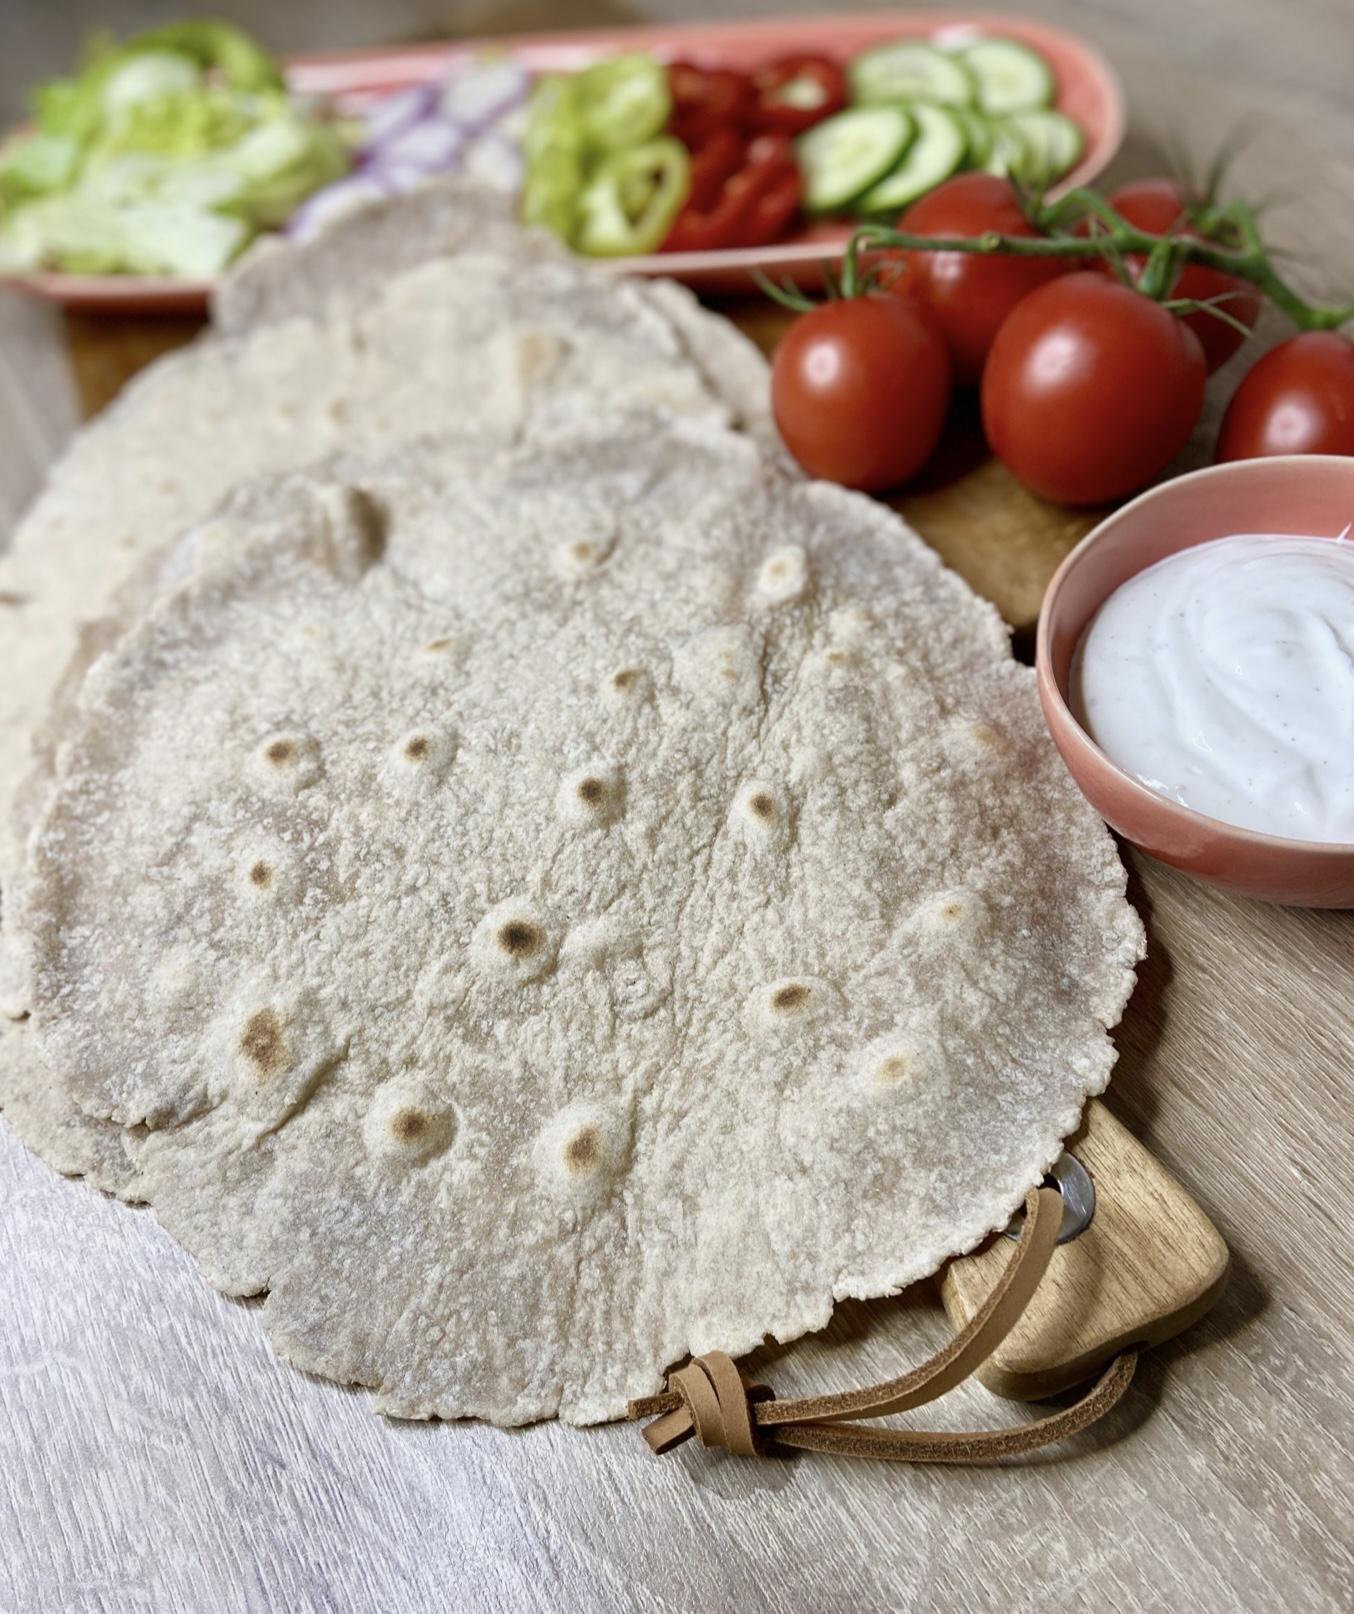 Gluténmentes tortilla